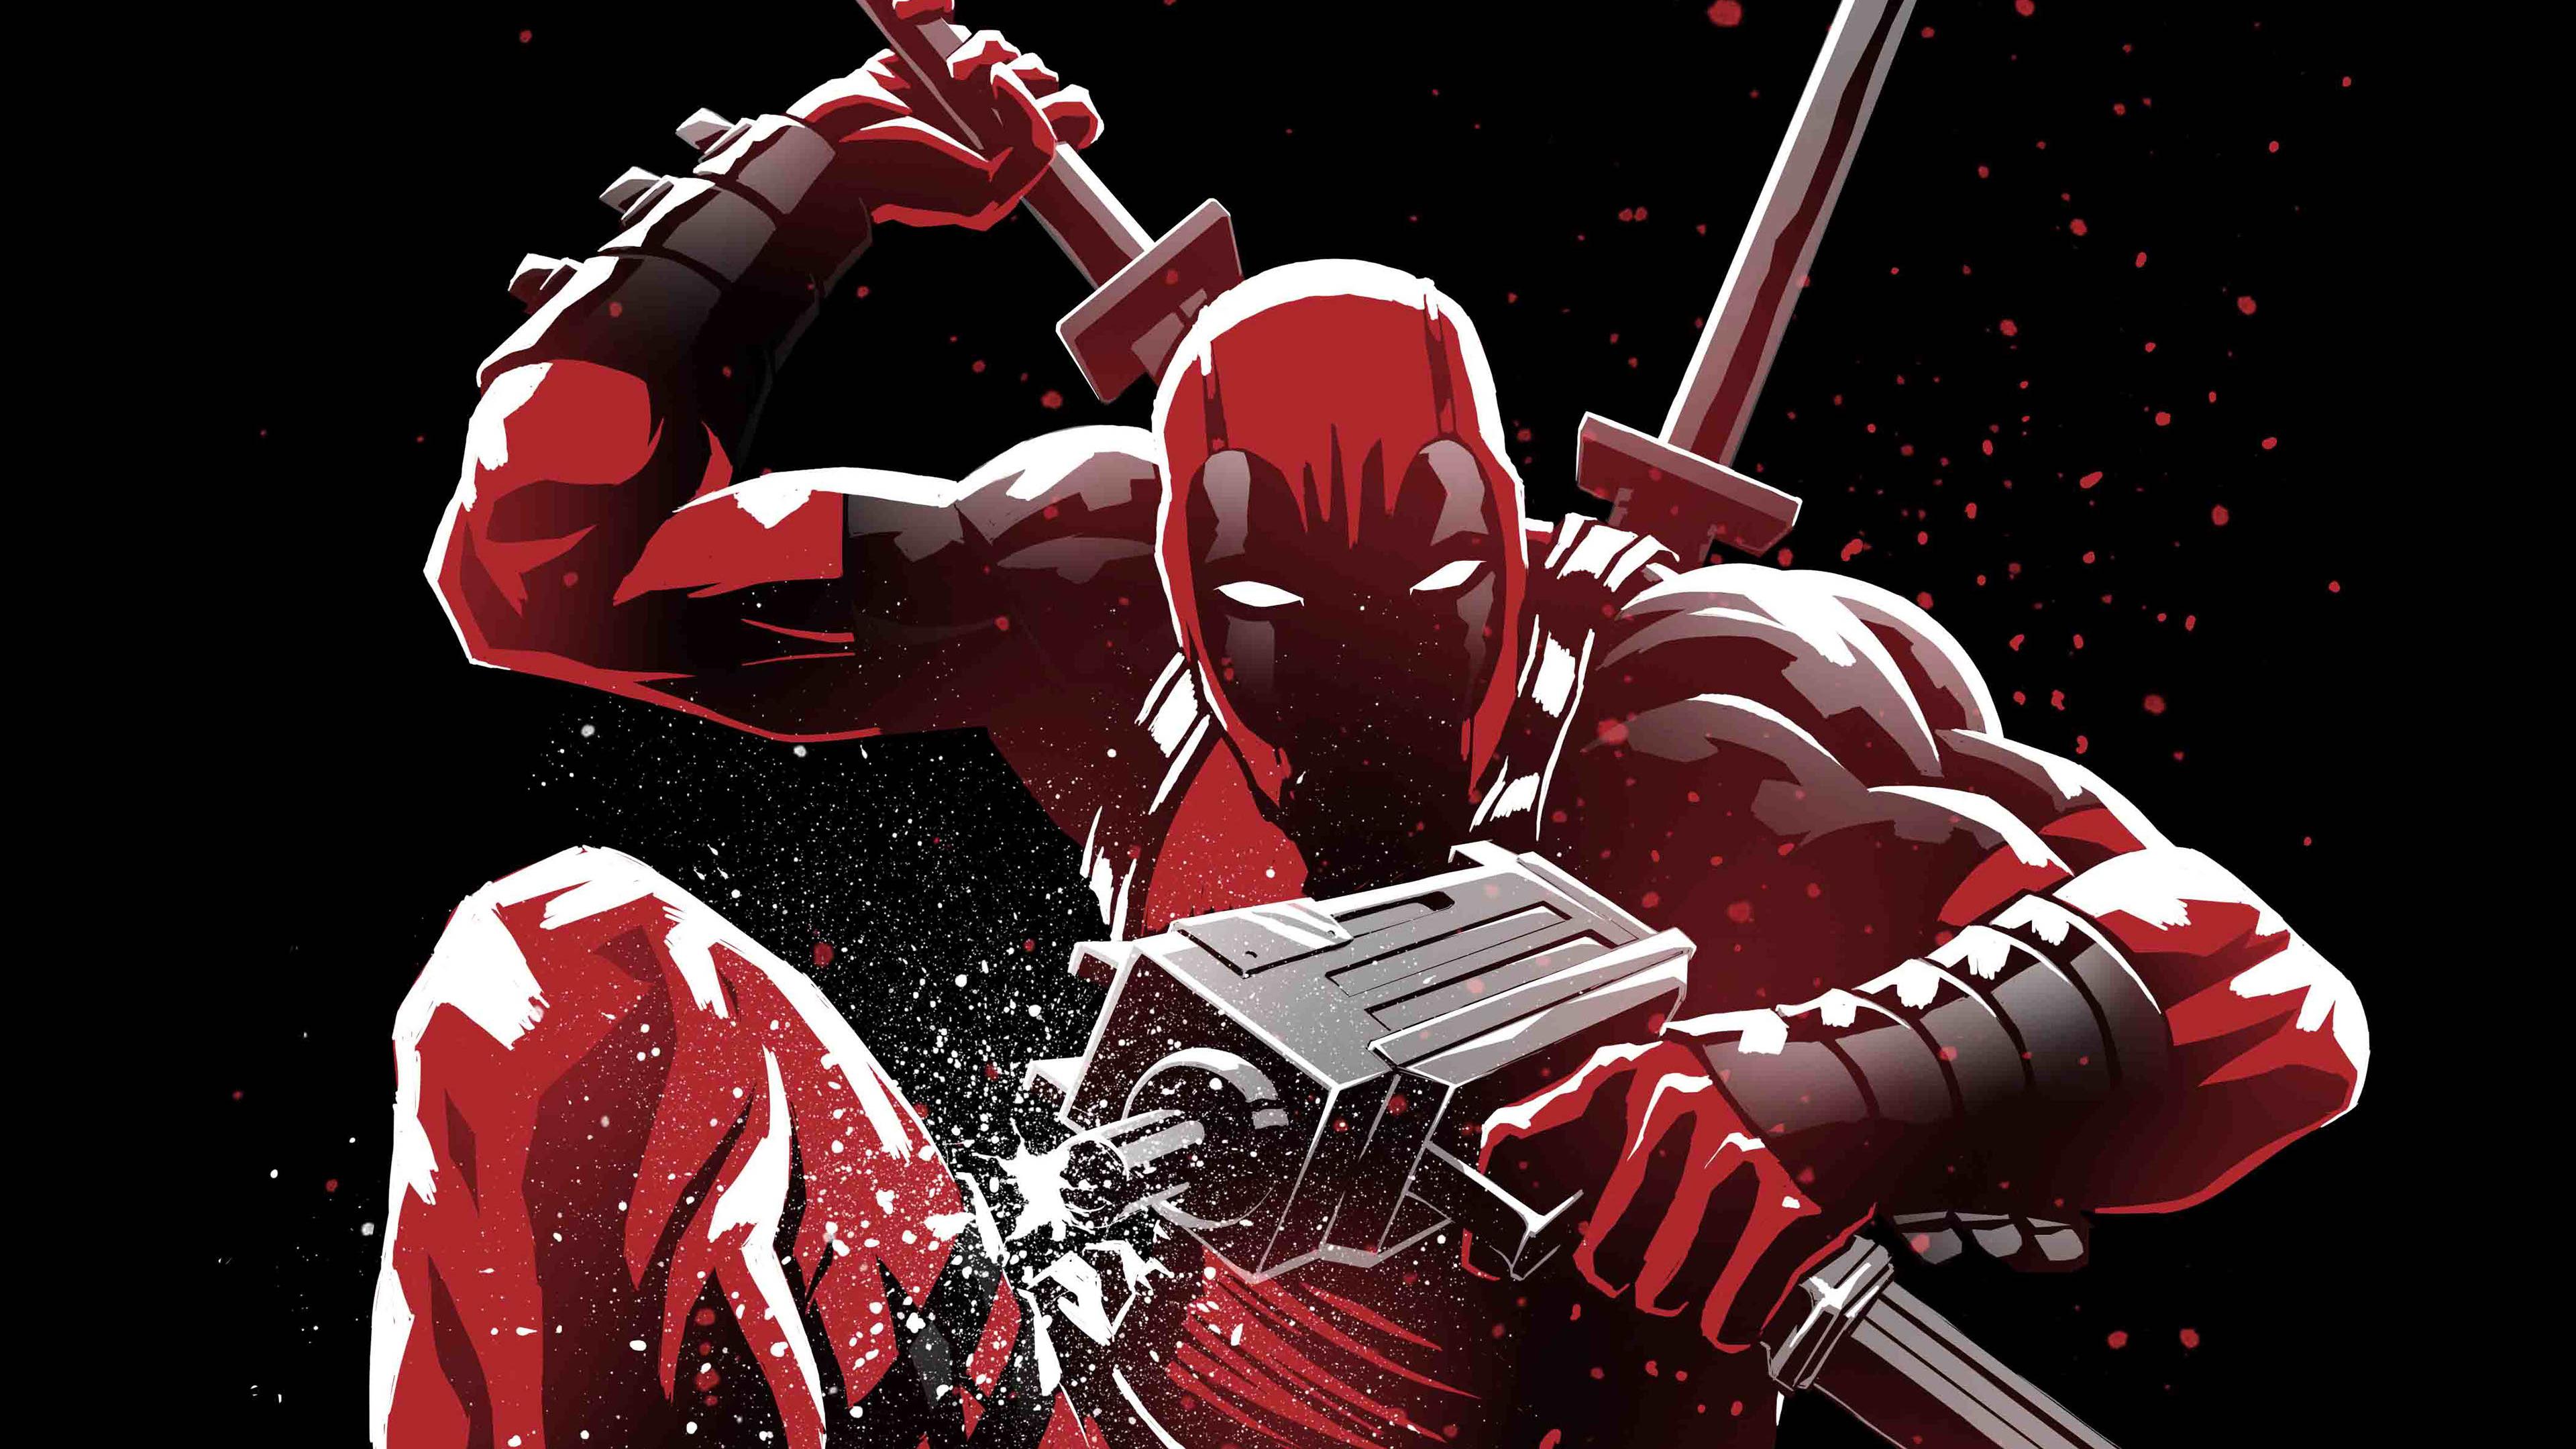 4k deadpool 1539452790 - 4k Deadpool - superheroes wallpapers, hd-wallpapers, digital art wallpapers, deadpool wallpapers, artwork wallpapers, art wallpapers, 4k-wallpapers